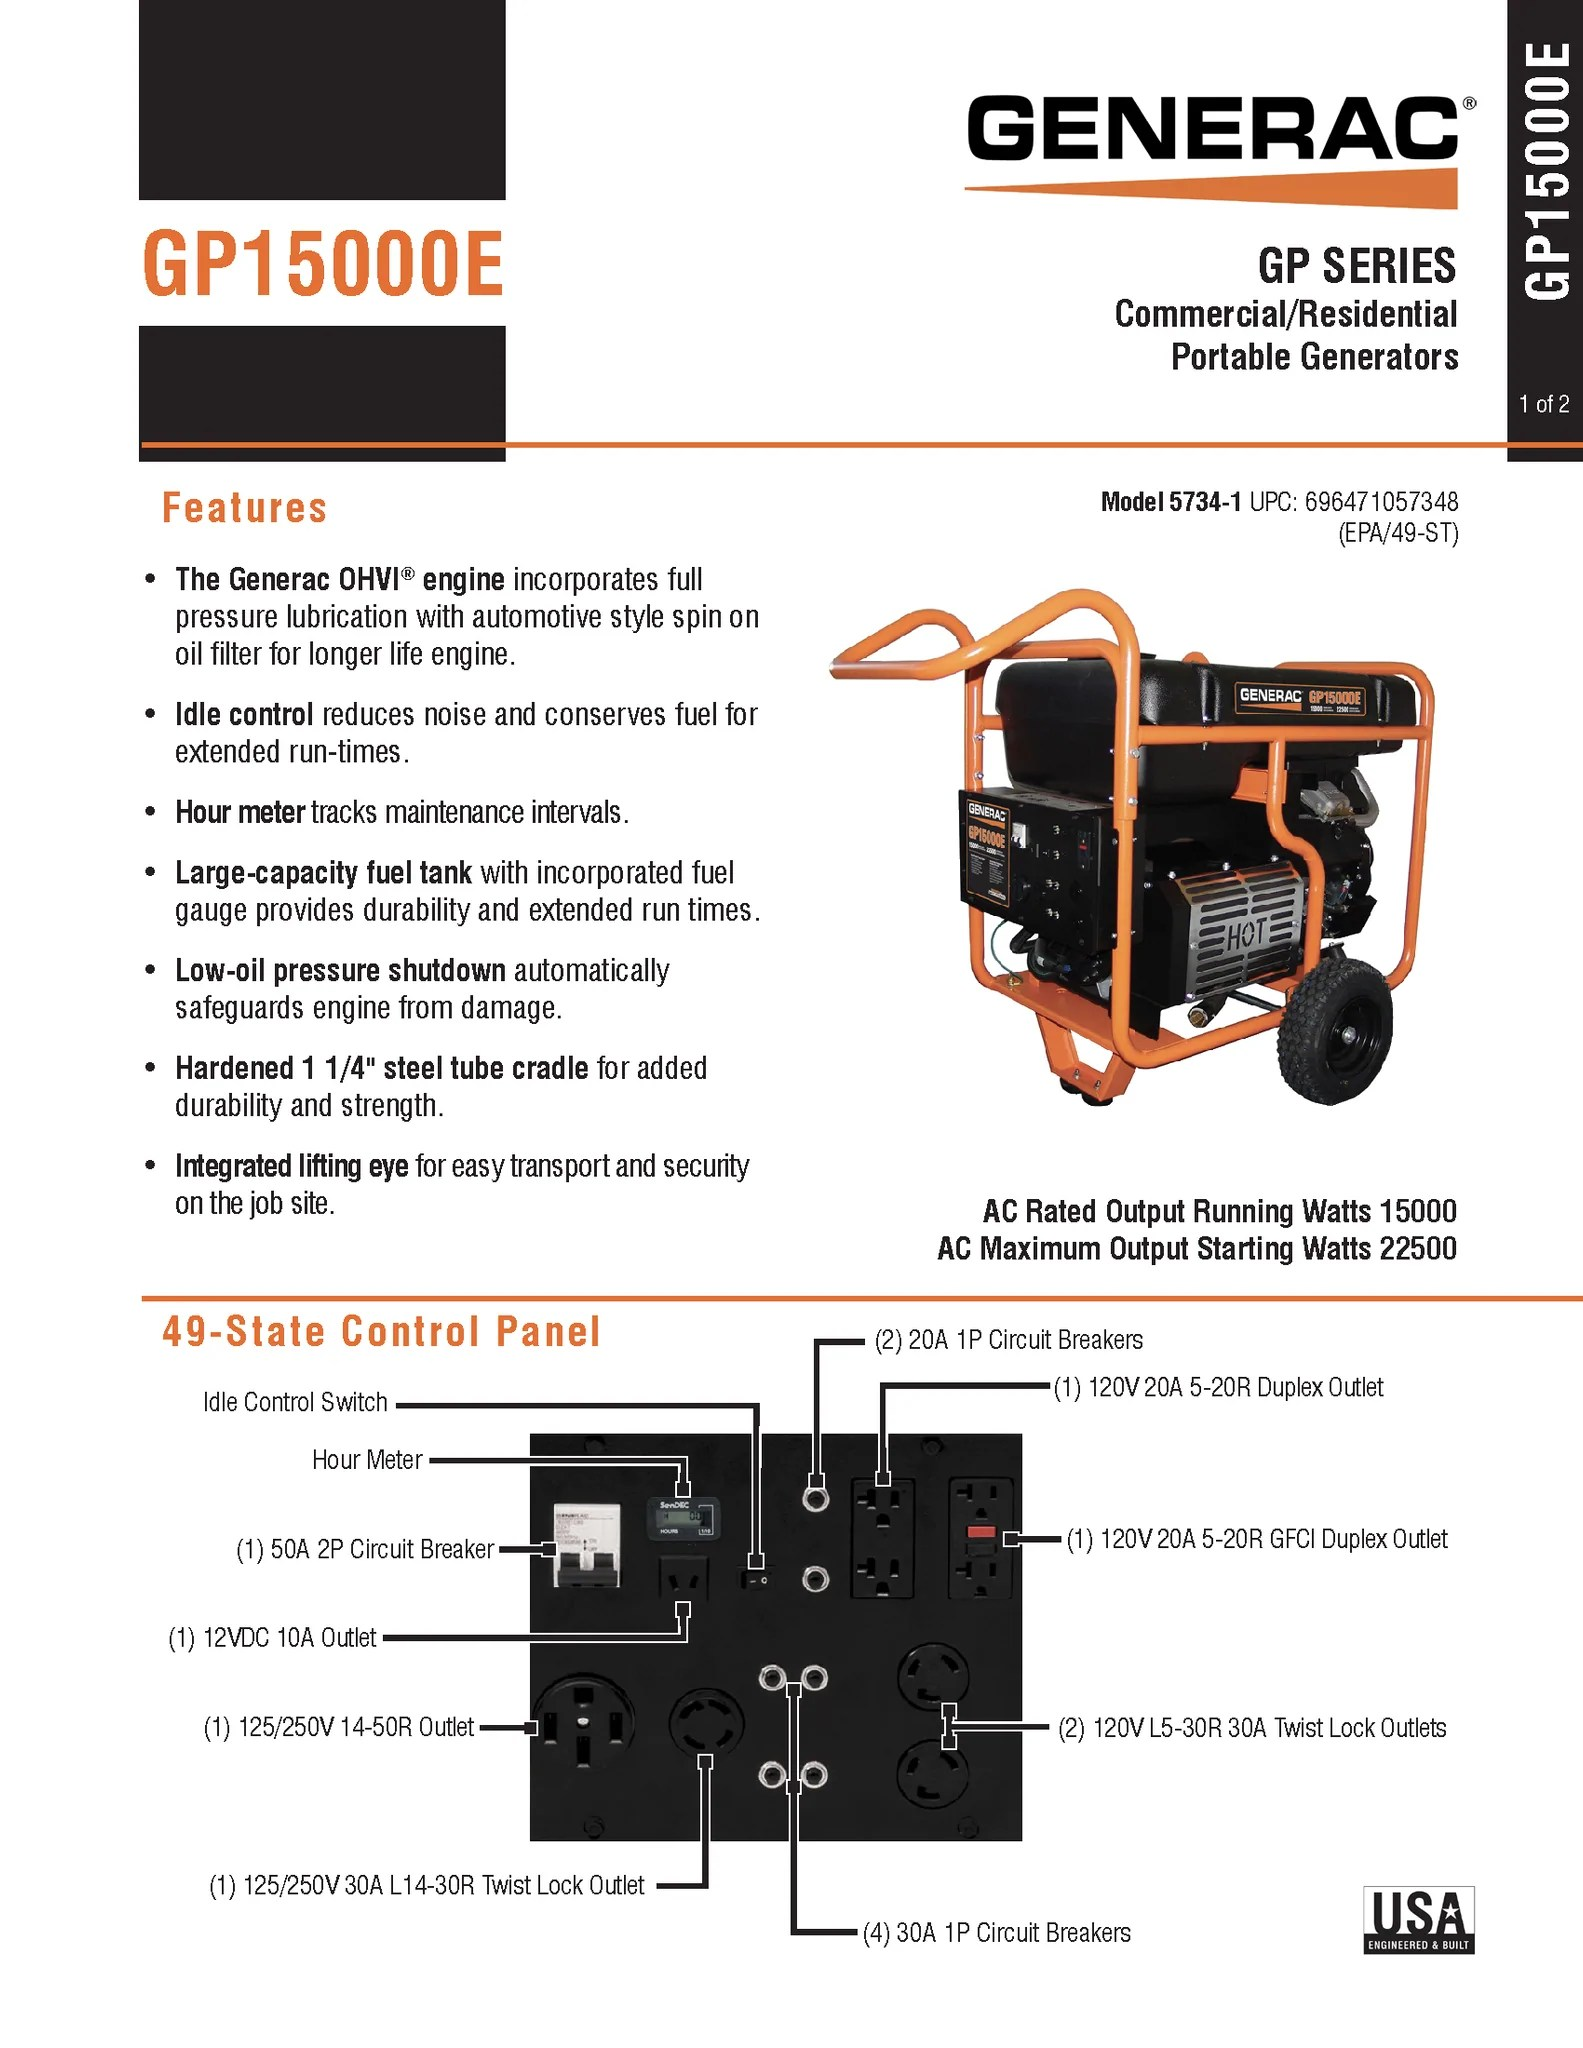 generac 5734 gp series gp15000e 15 000 watt 992 cc ohvi portable gas powered generator with electric start non carb compliant 12vdc 365 cca battery  [ 1583 x 2048 Pixel ]